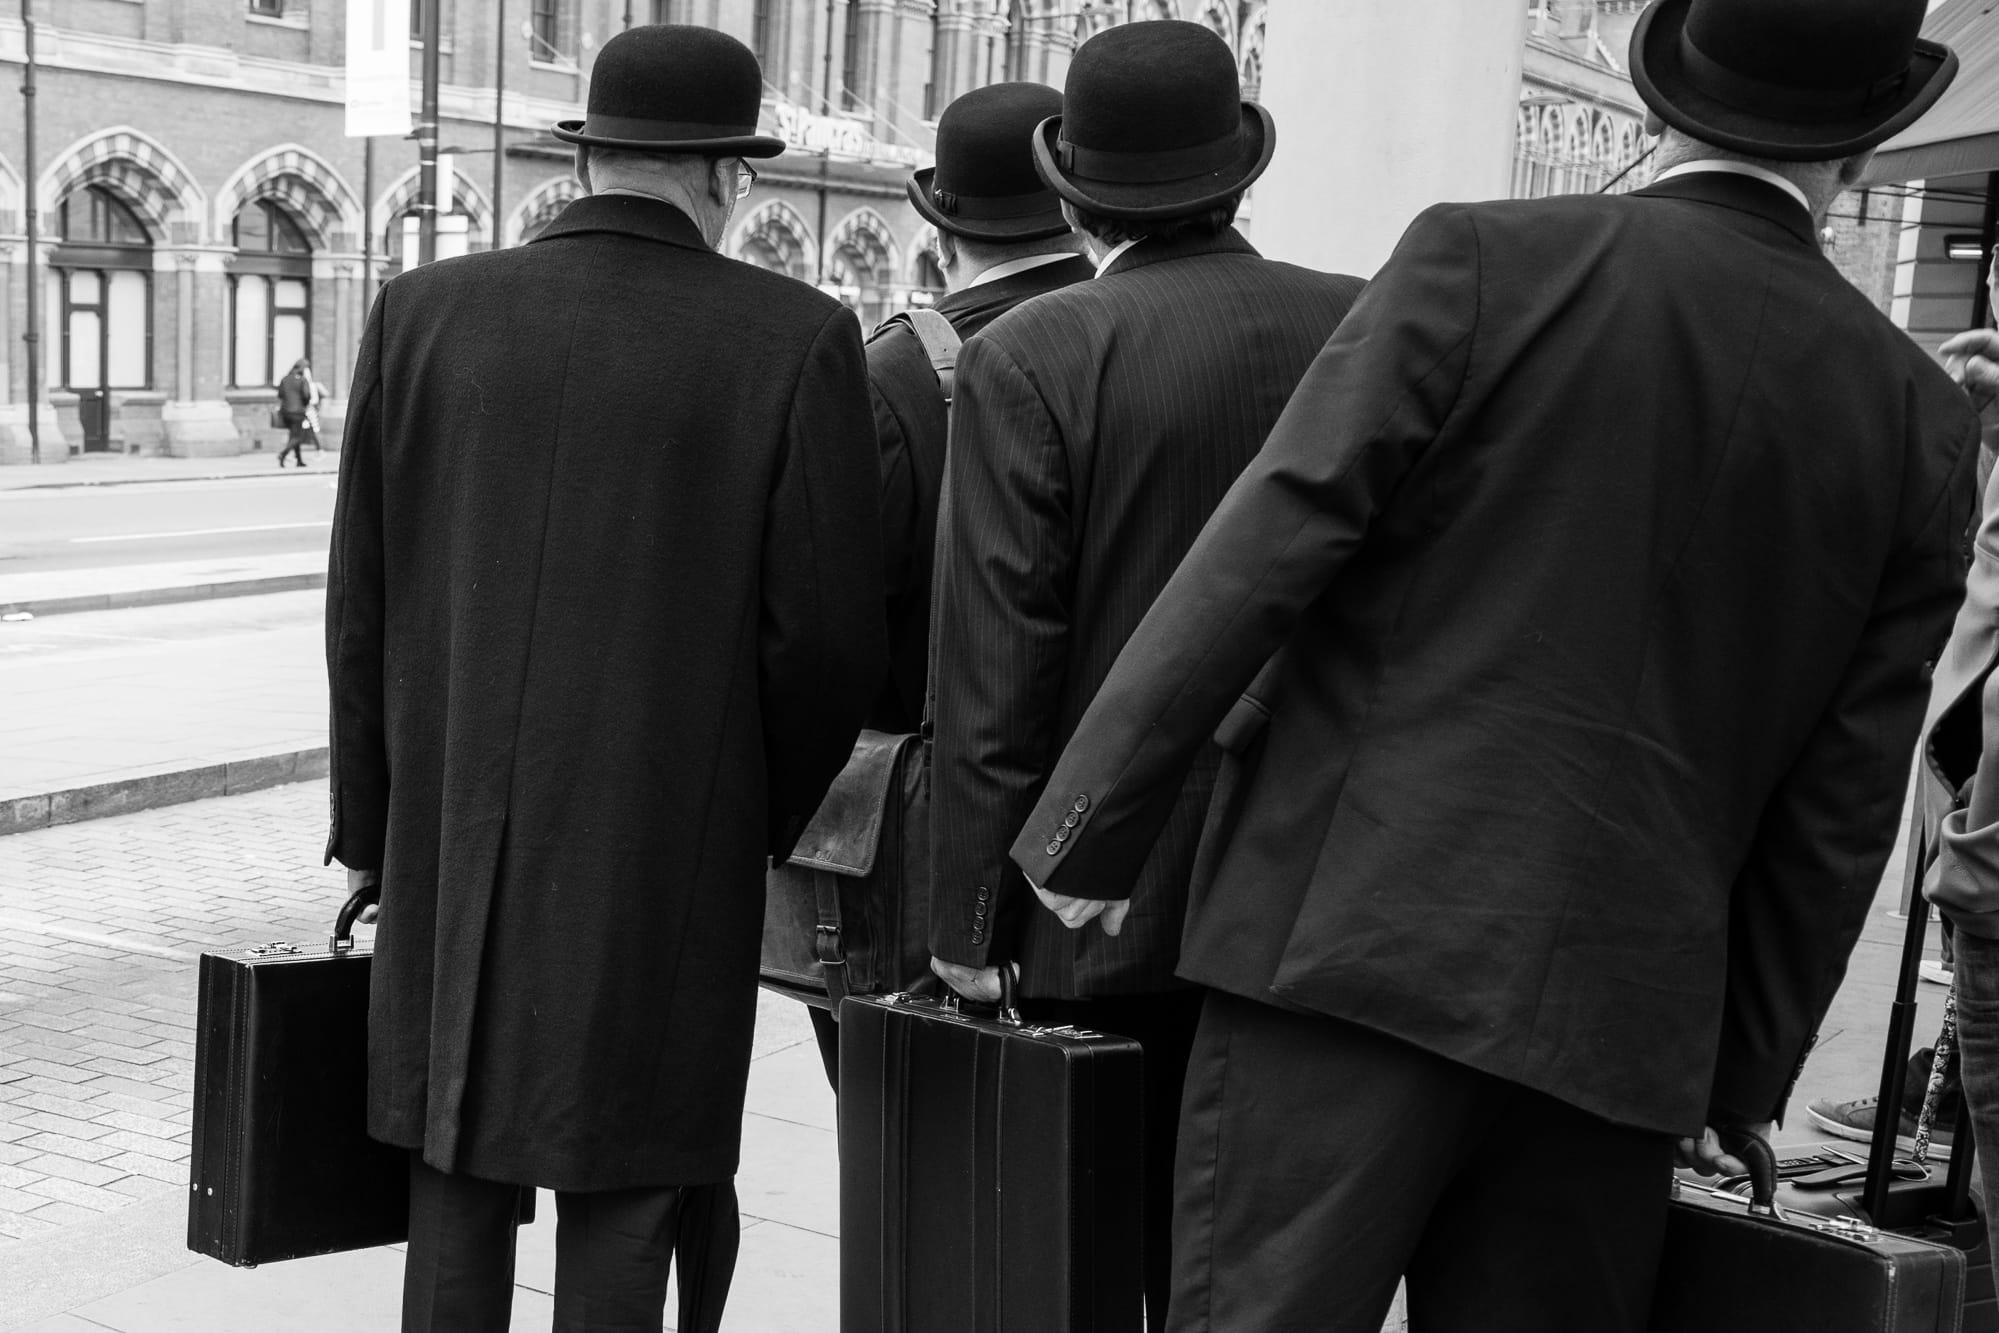 querformat-fotografie - Achim Katzberg - querformat-fotografie_big_city_life-018